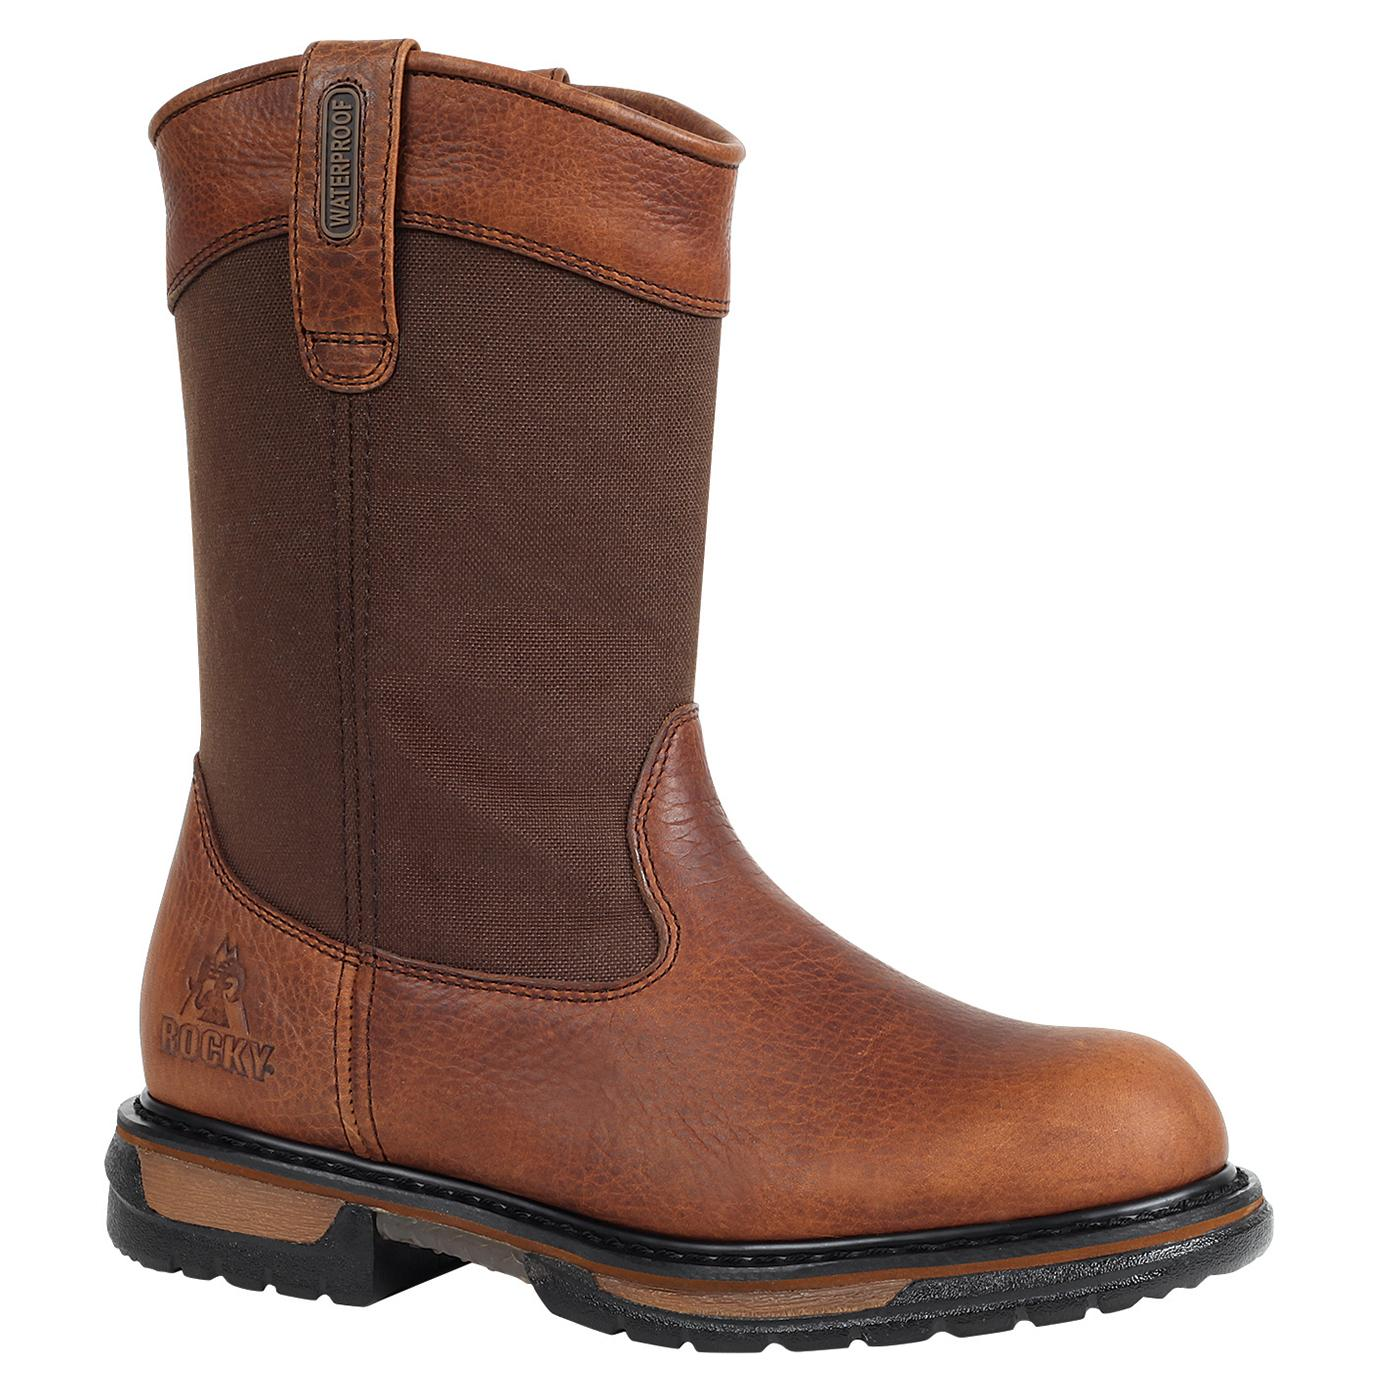 a98f9c6e5e5 Rocky IronClad Steel Toe Waterproof Wellington Boot